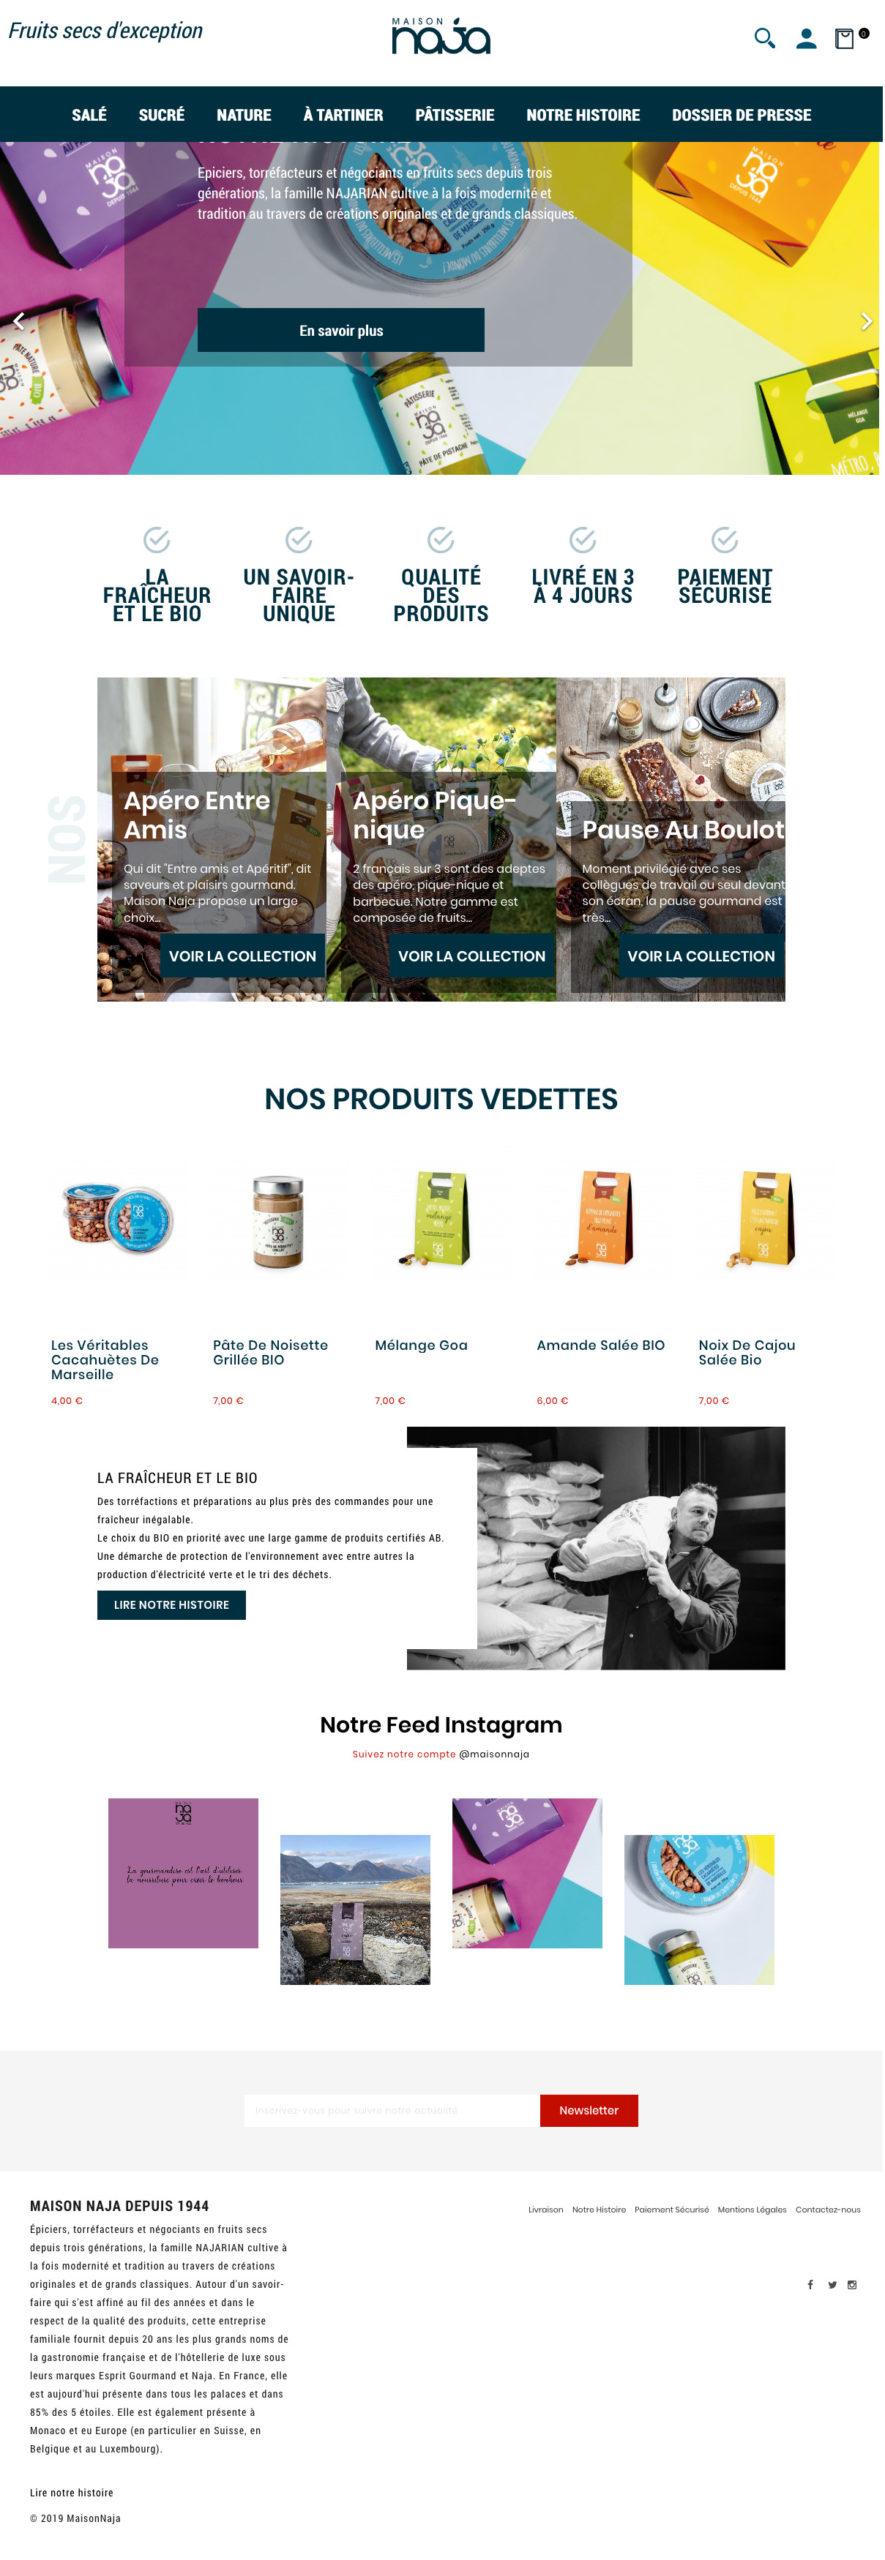 maisonnaja.com